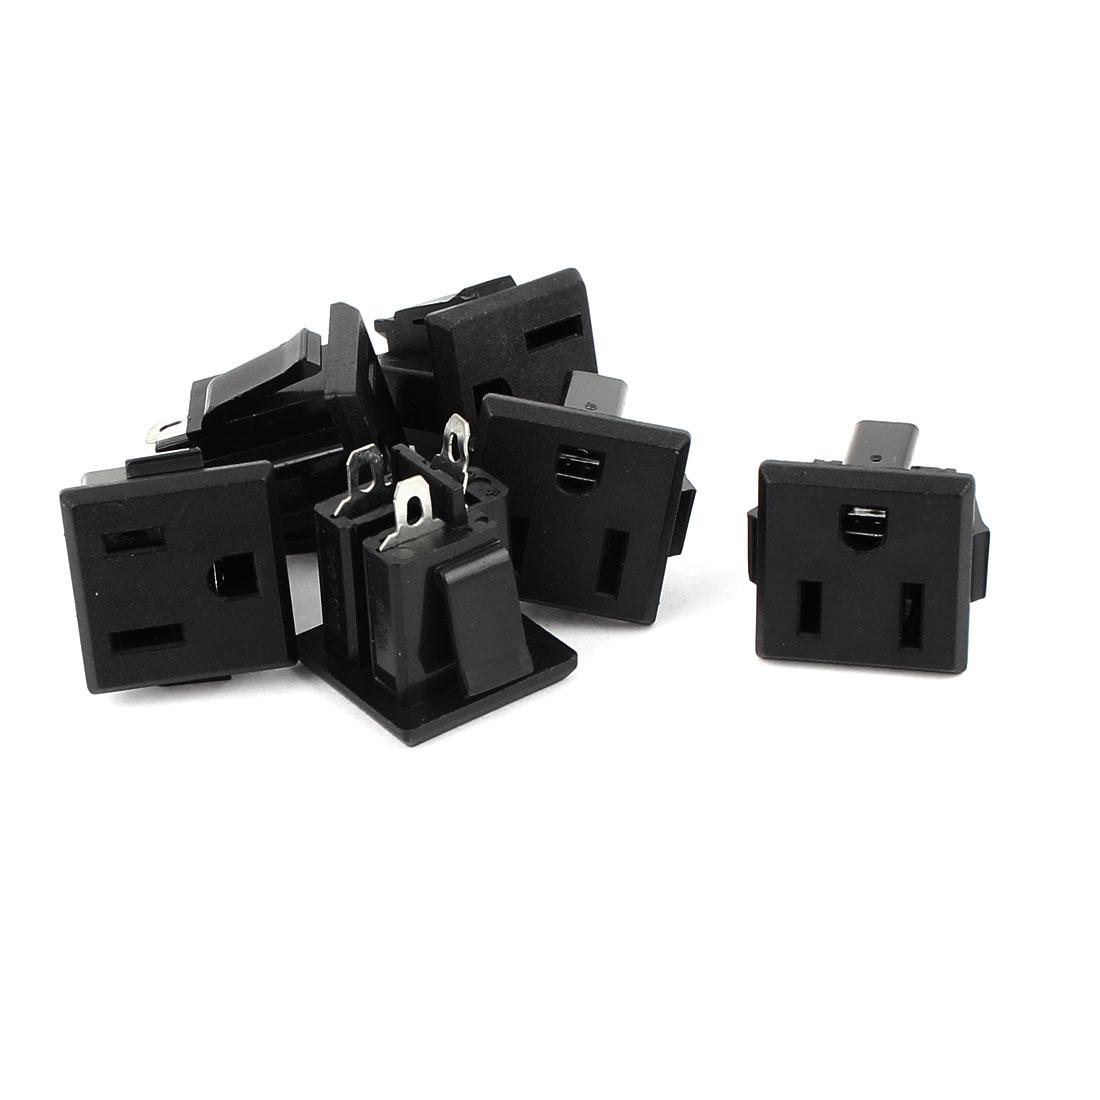 6 Pcs AC 125V 15A Panel Mount Power Socket Connector Black for US 2Pin Plug